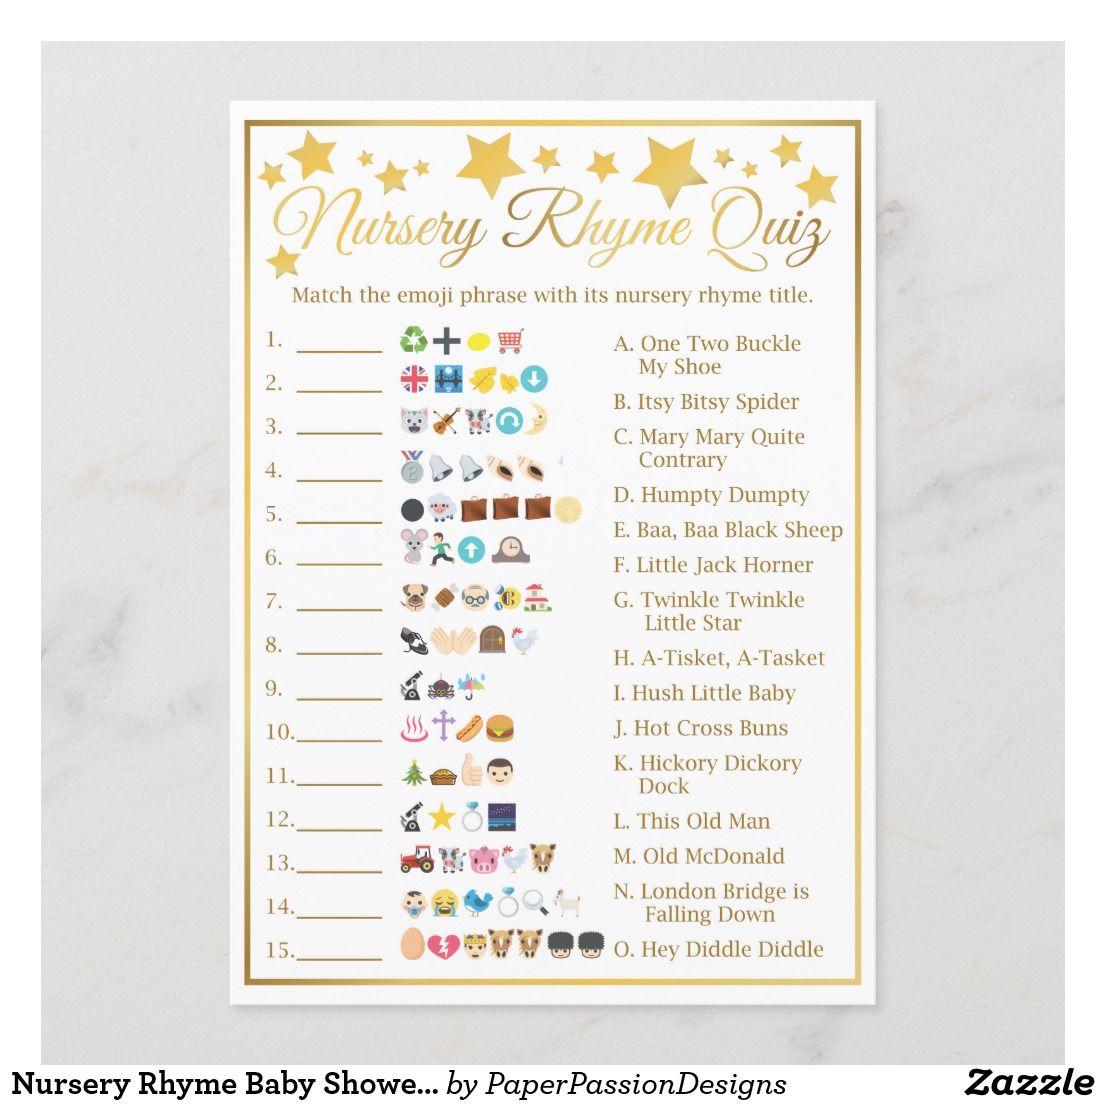 Nursery Rhyme Baby Shower Emoji Game Gold Star | Zazzle ...